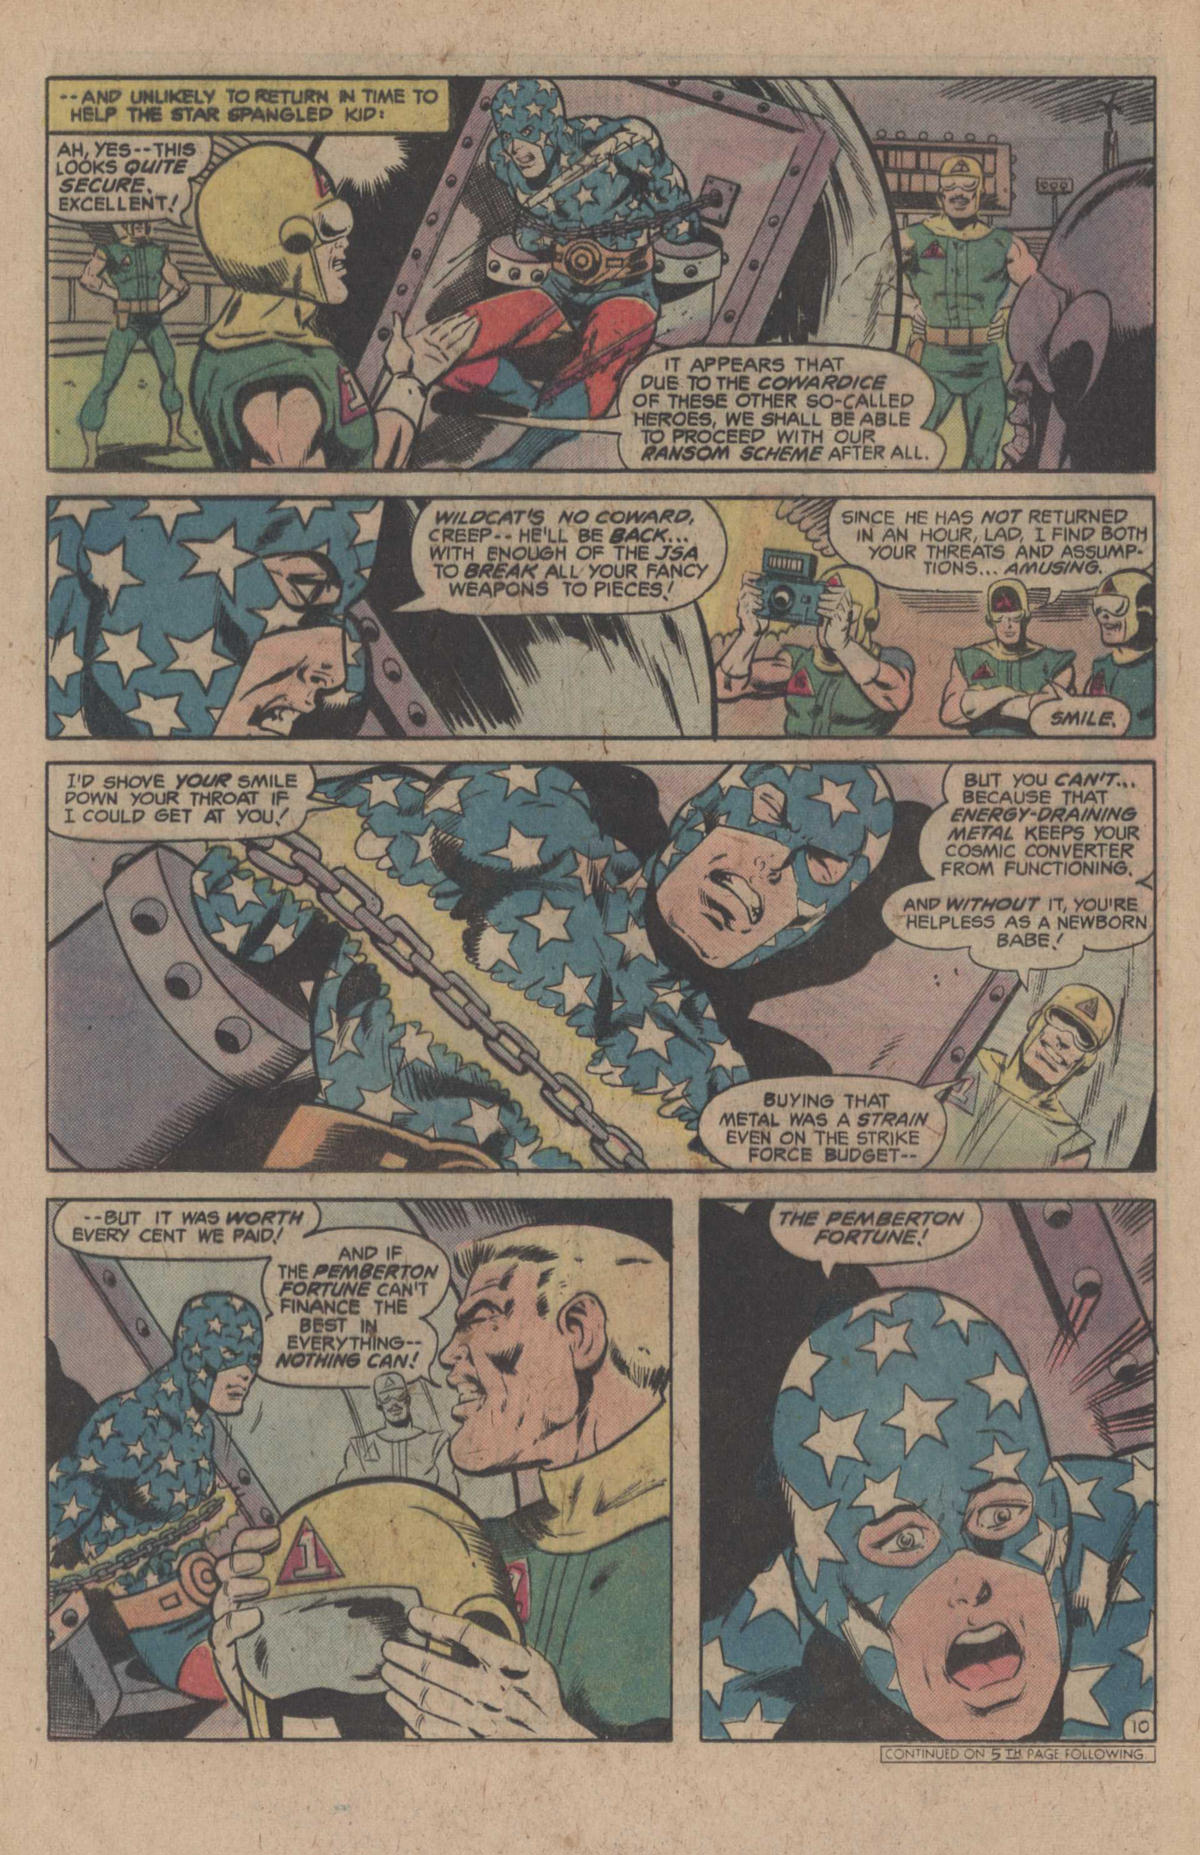 Read online All-Star Comics comic -  Issue #71 - 16